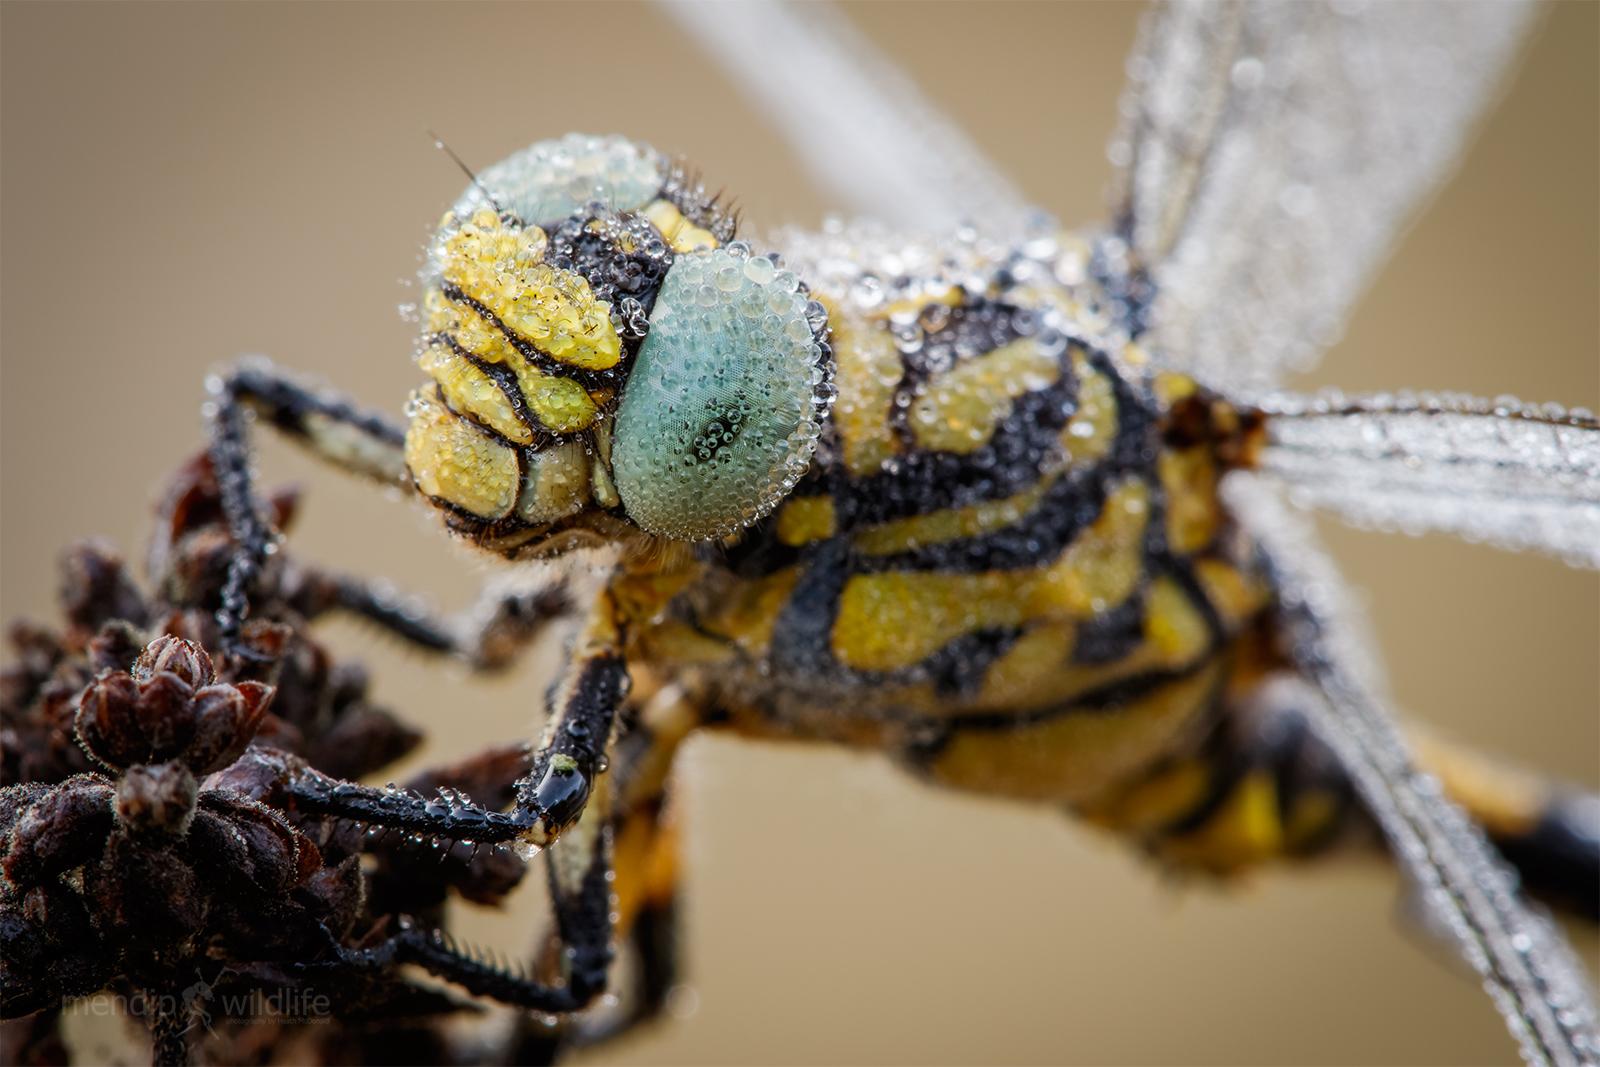 Piccola Pincertail - Onicogomphus forcipatus...